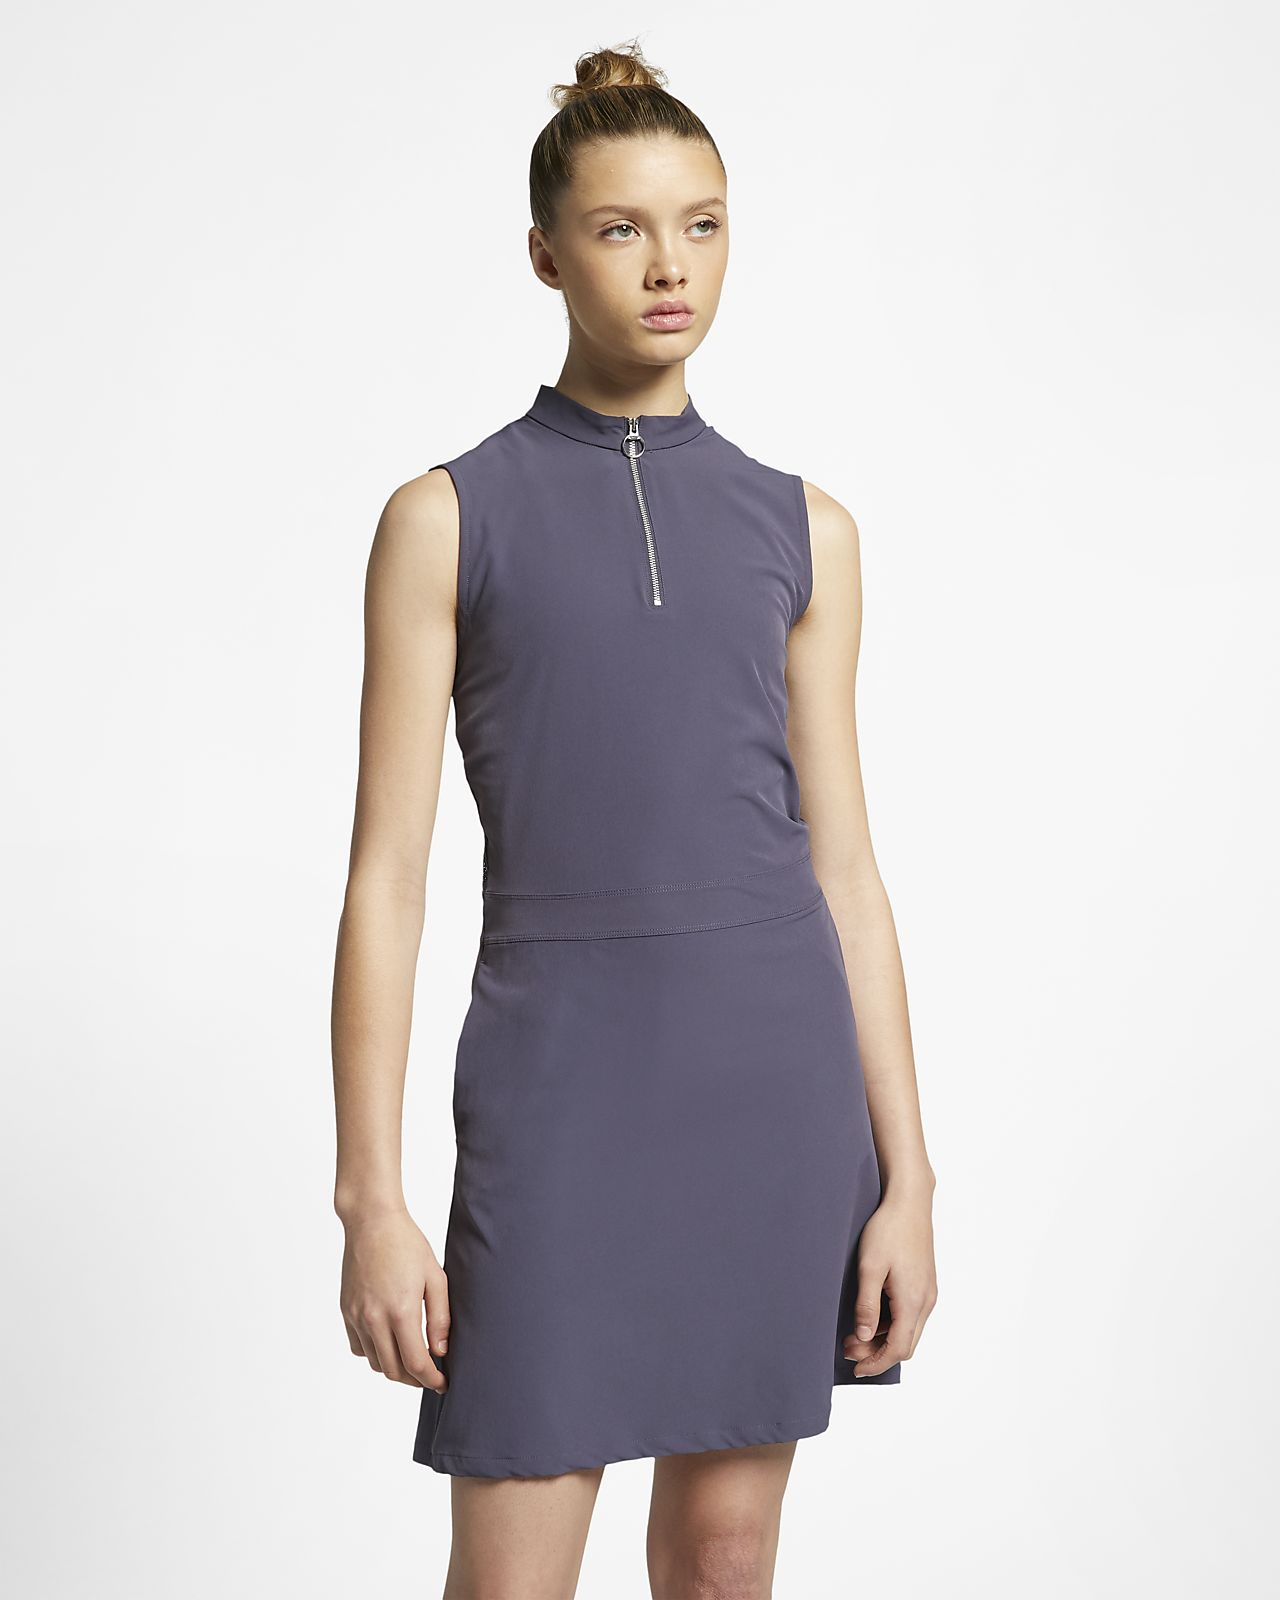 Robe de golf Nike Flex pour Femme